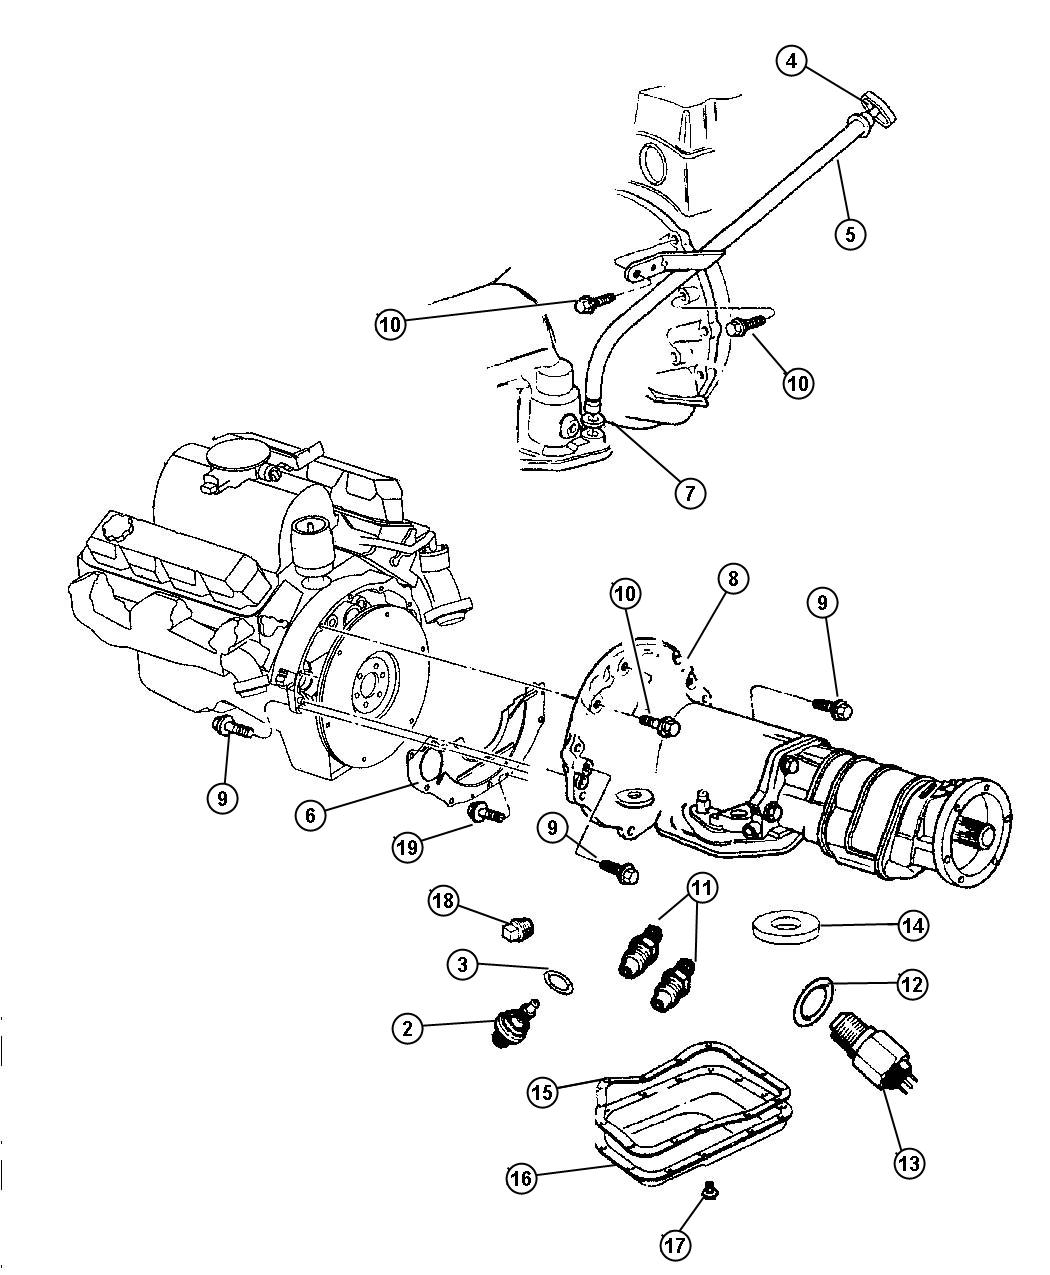 Dodge Durango Switch. Neutral safety, back up, neutral